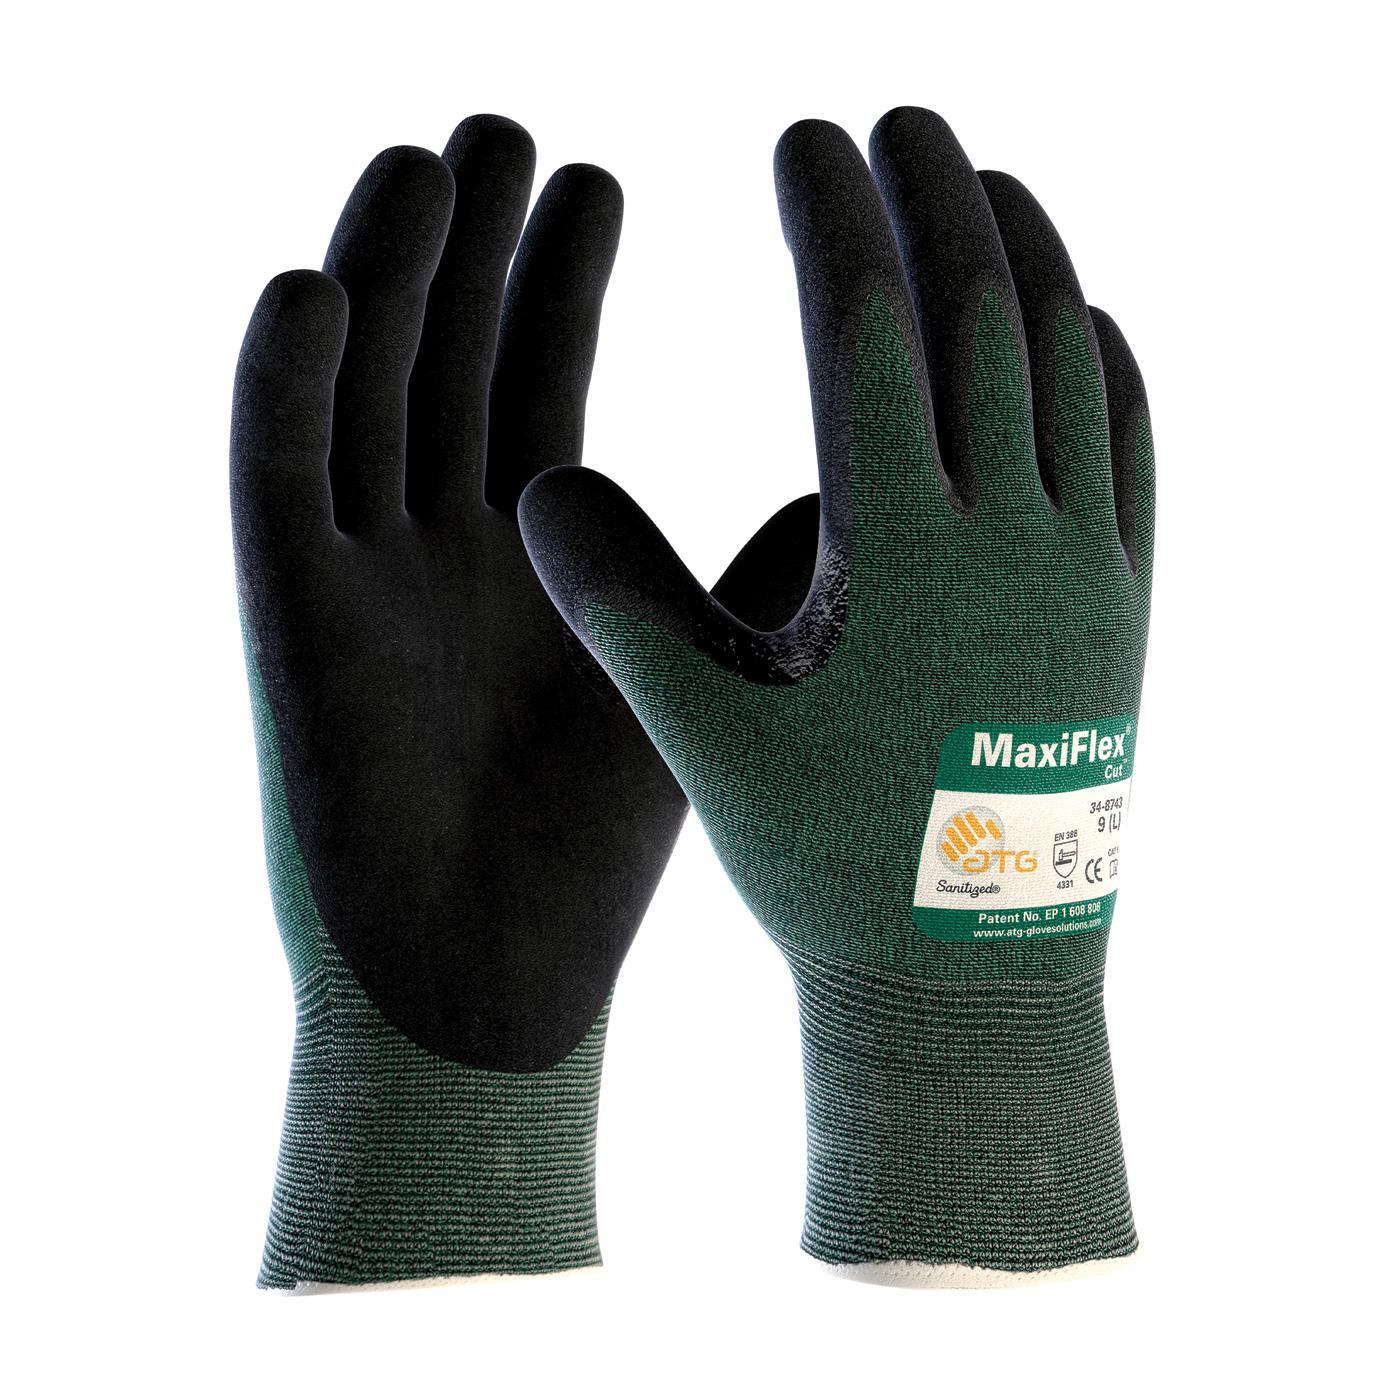 PIP® MaxiFlex® Cut™ Green 15G Seamless Knit Cut Resistant Nitrile Coated Microfoam Grip Gloves